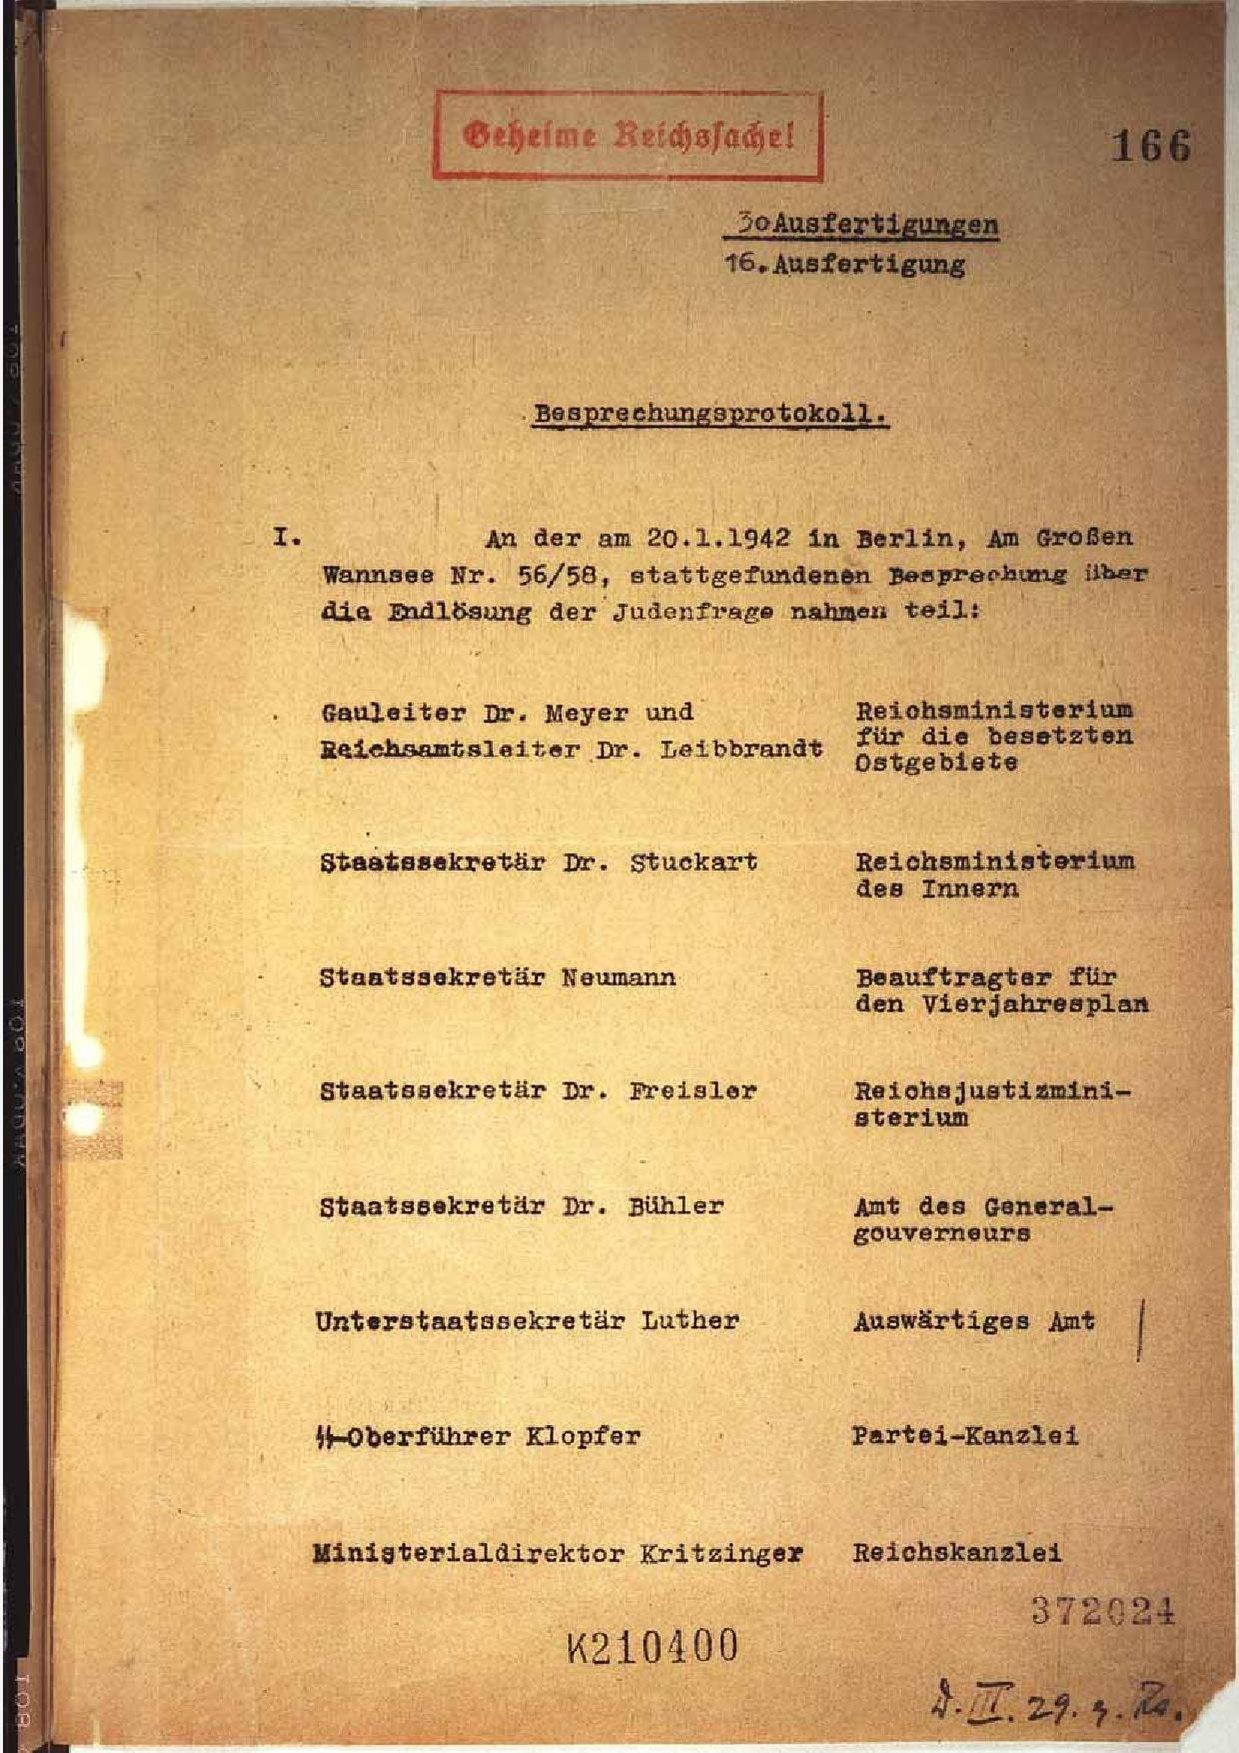 Filewannsee Protokoll Januar 1942pdf Wikimedia Commons Original File 1239 X 1754 Pixels Size 211 Mb Mime